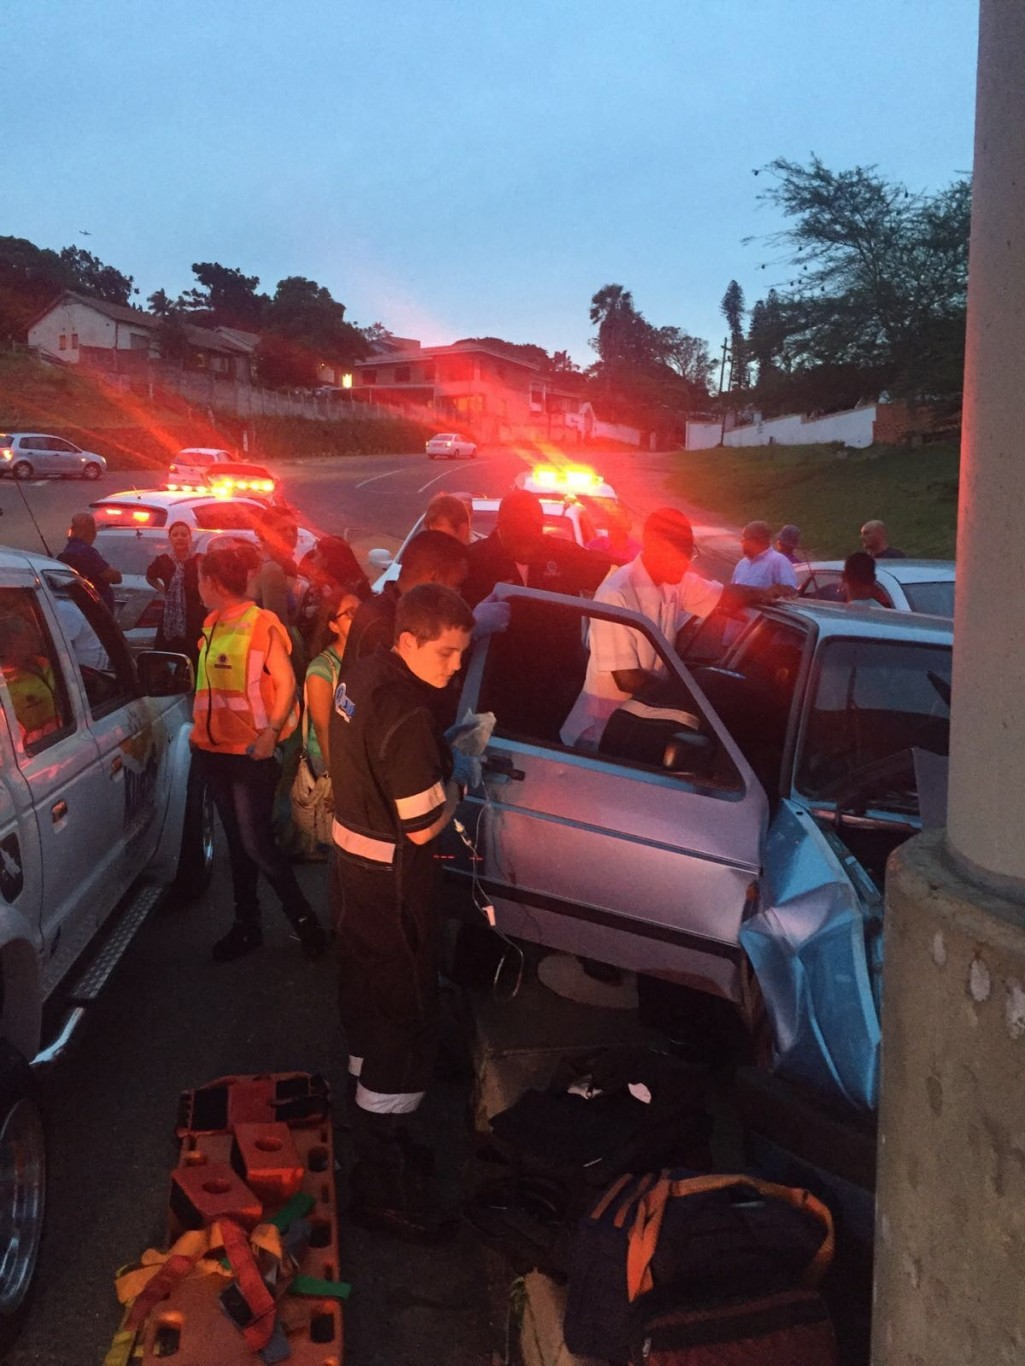 Man seriously injured as car smashes into bridge, Redhill, Durban